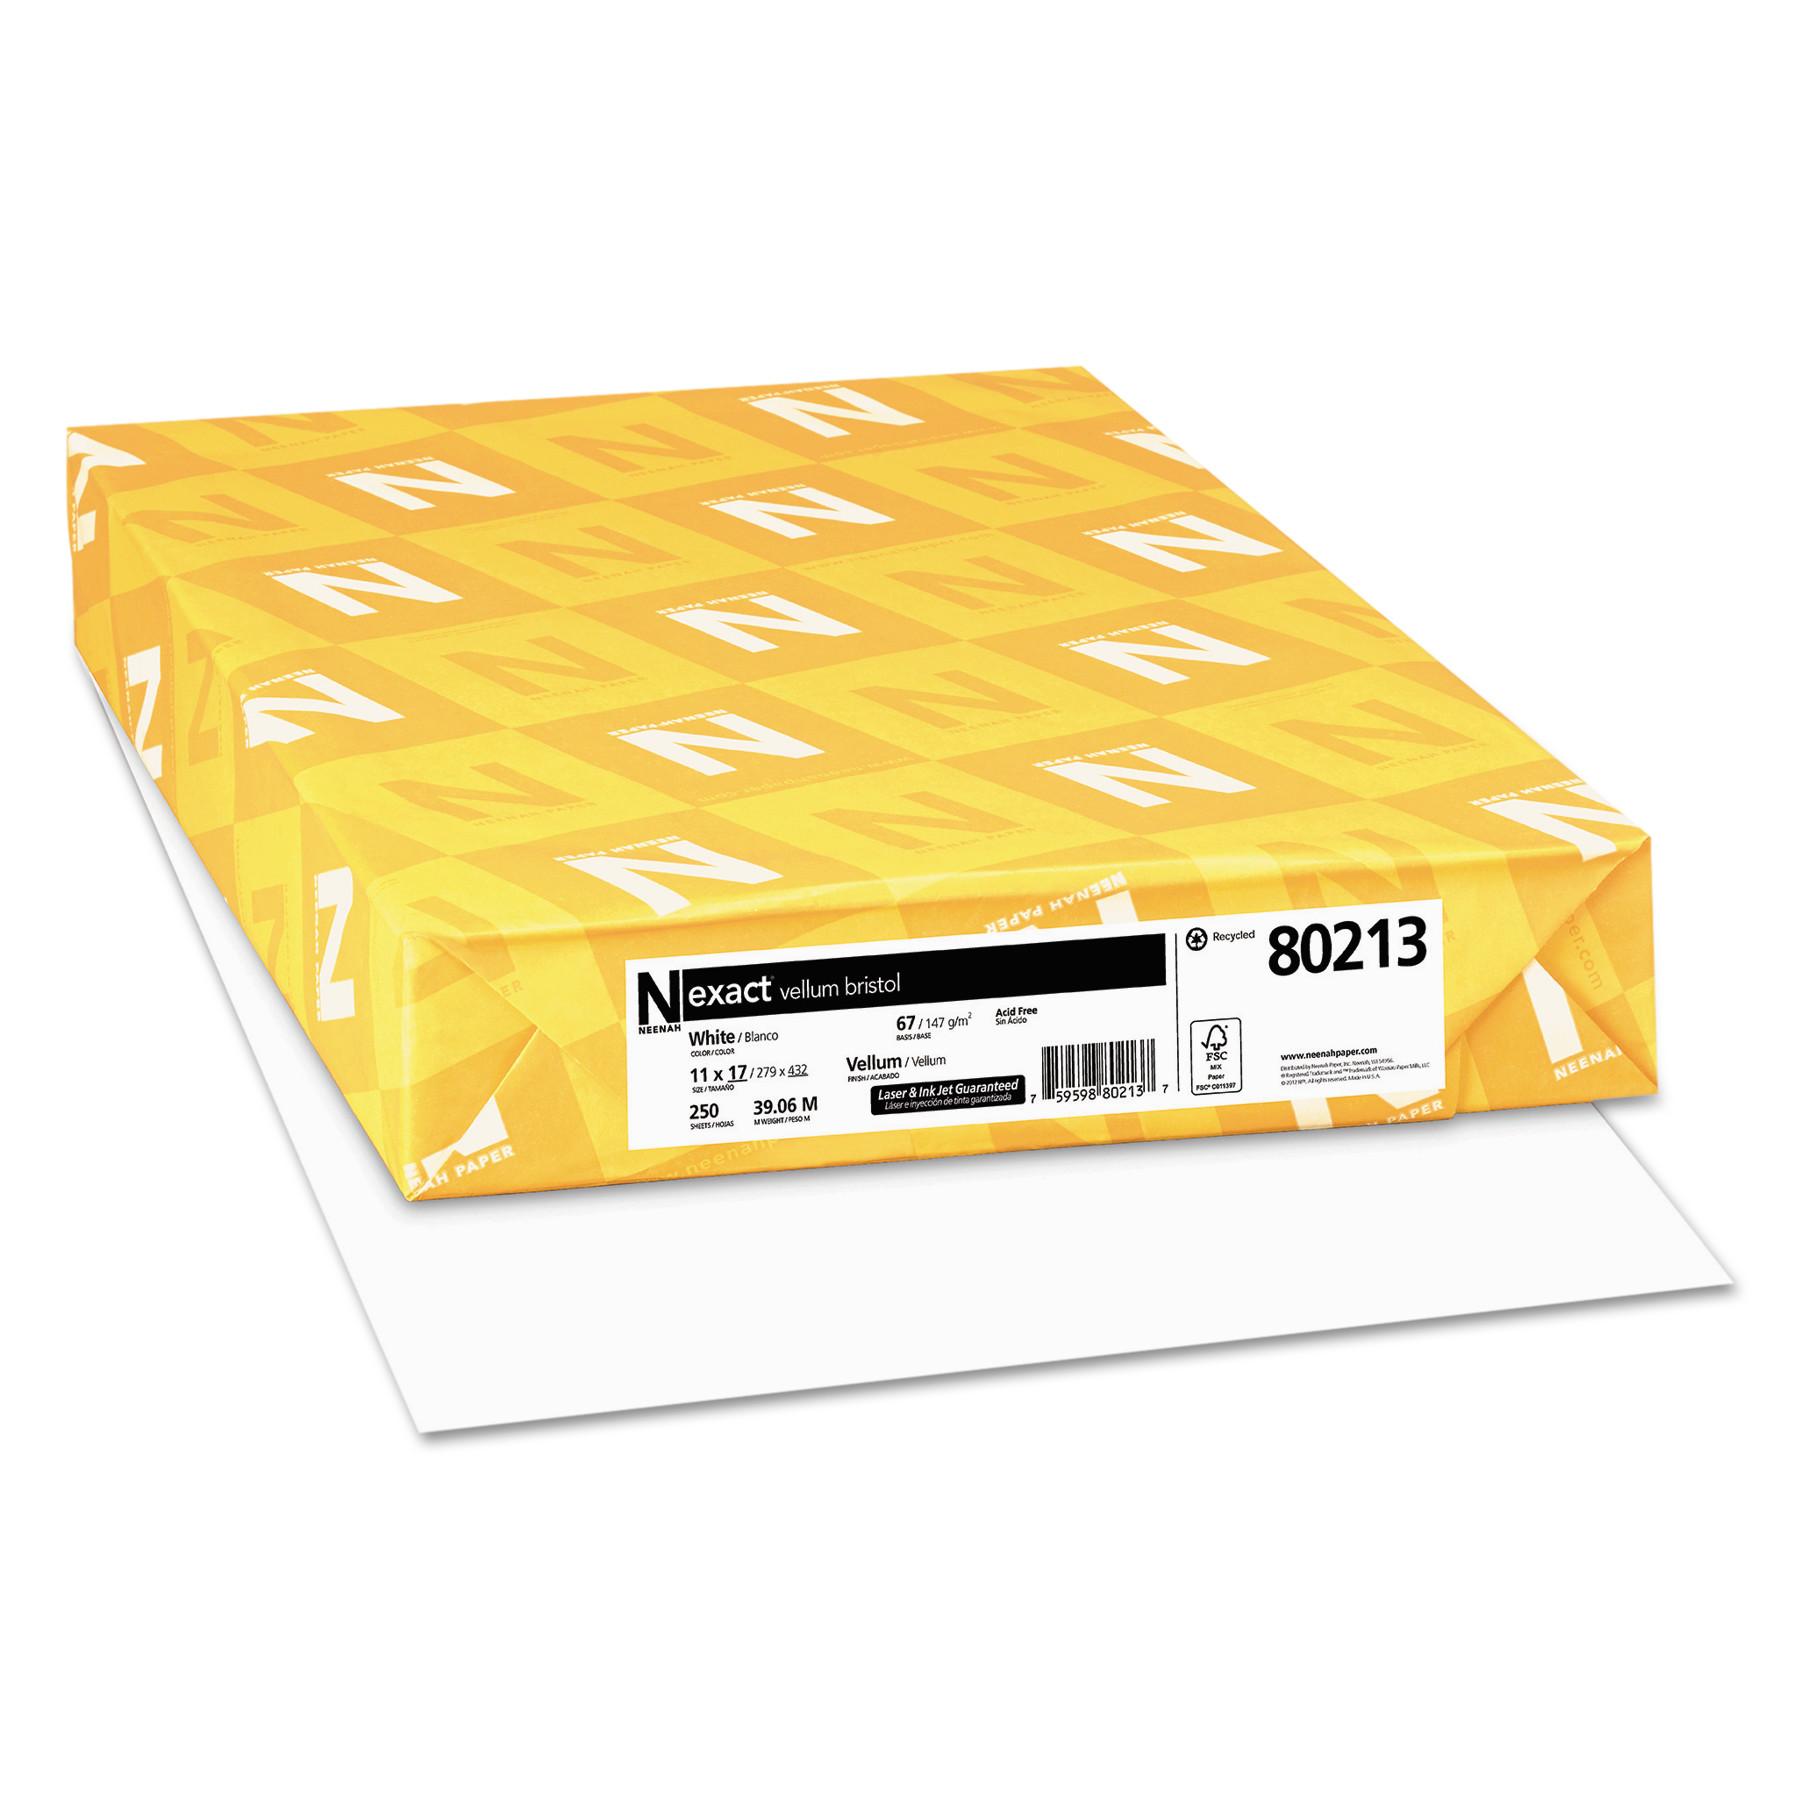 Exact Vellum Bristol Med-Heavyweight Paper, 67lb, 92 Bright, 11 x 17, 250 Sheets